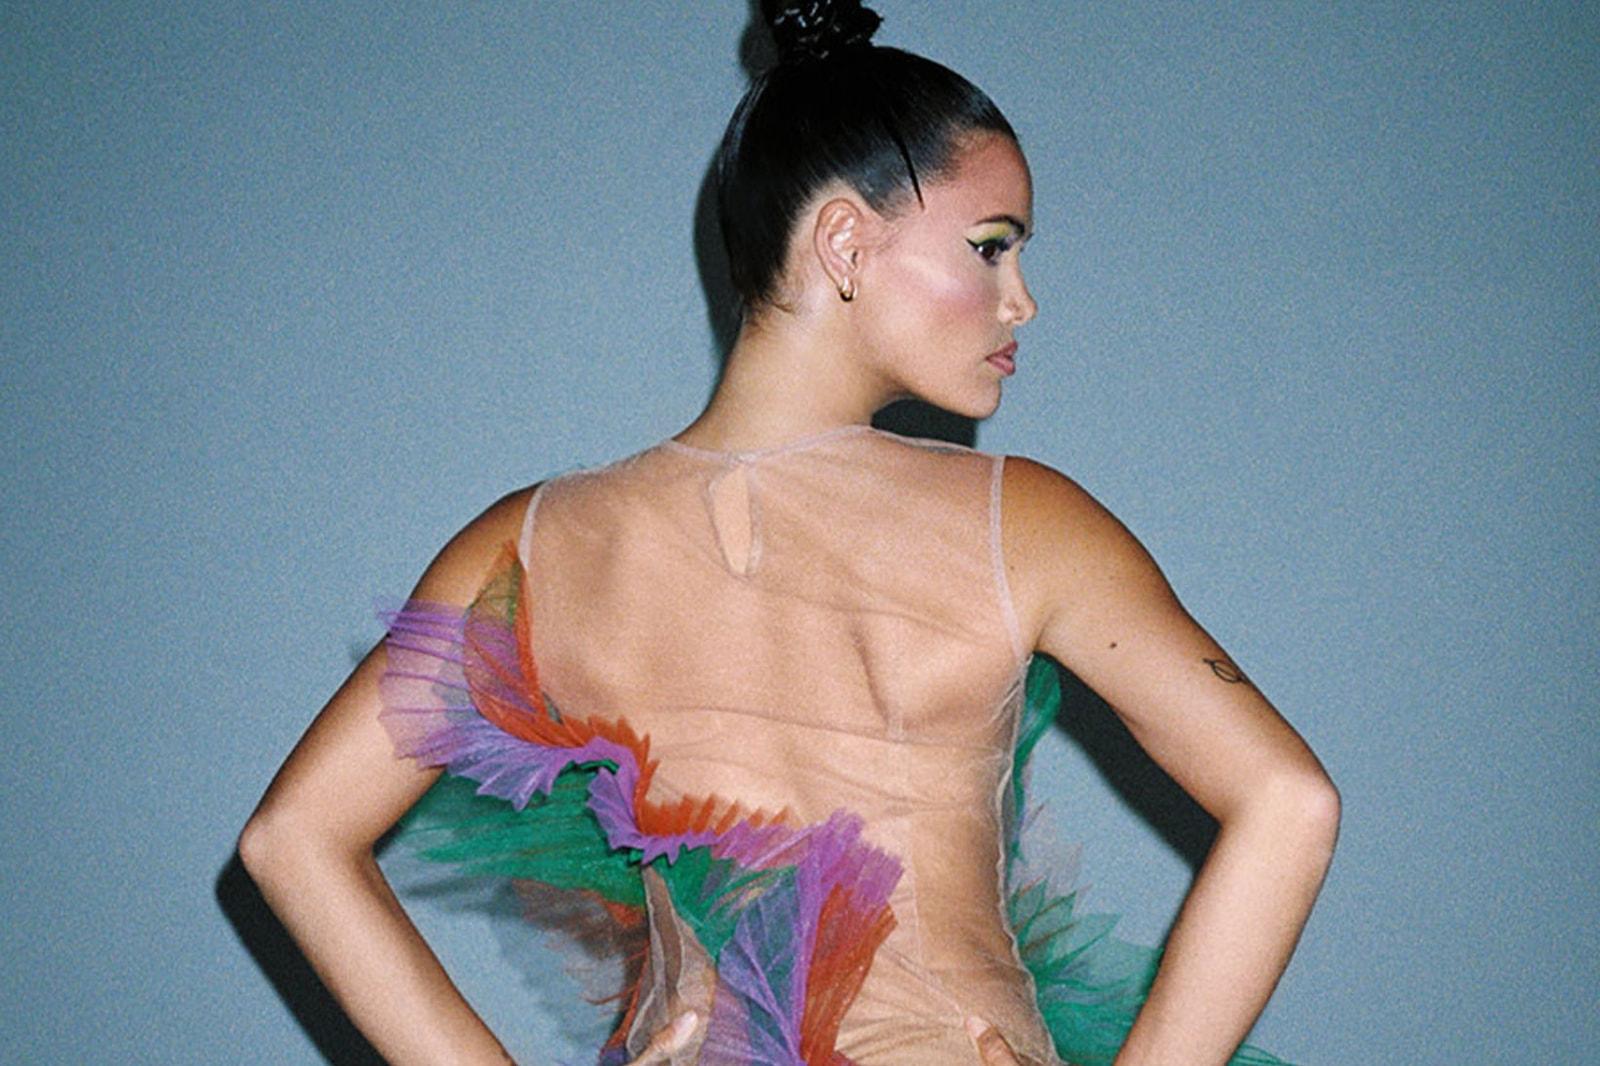 Sinéad Harnett ready is always too late lp album artwork musician singer R&B London Thai Irish Los Angeles Artist Music